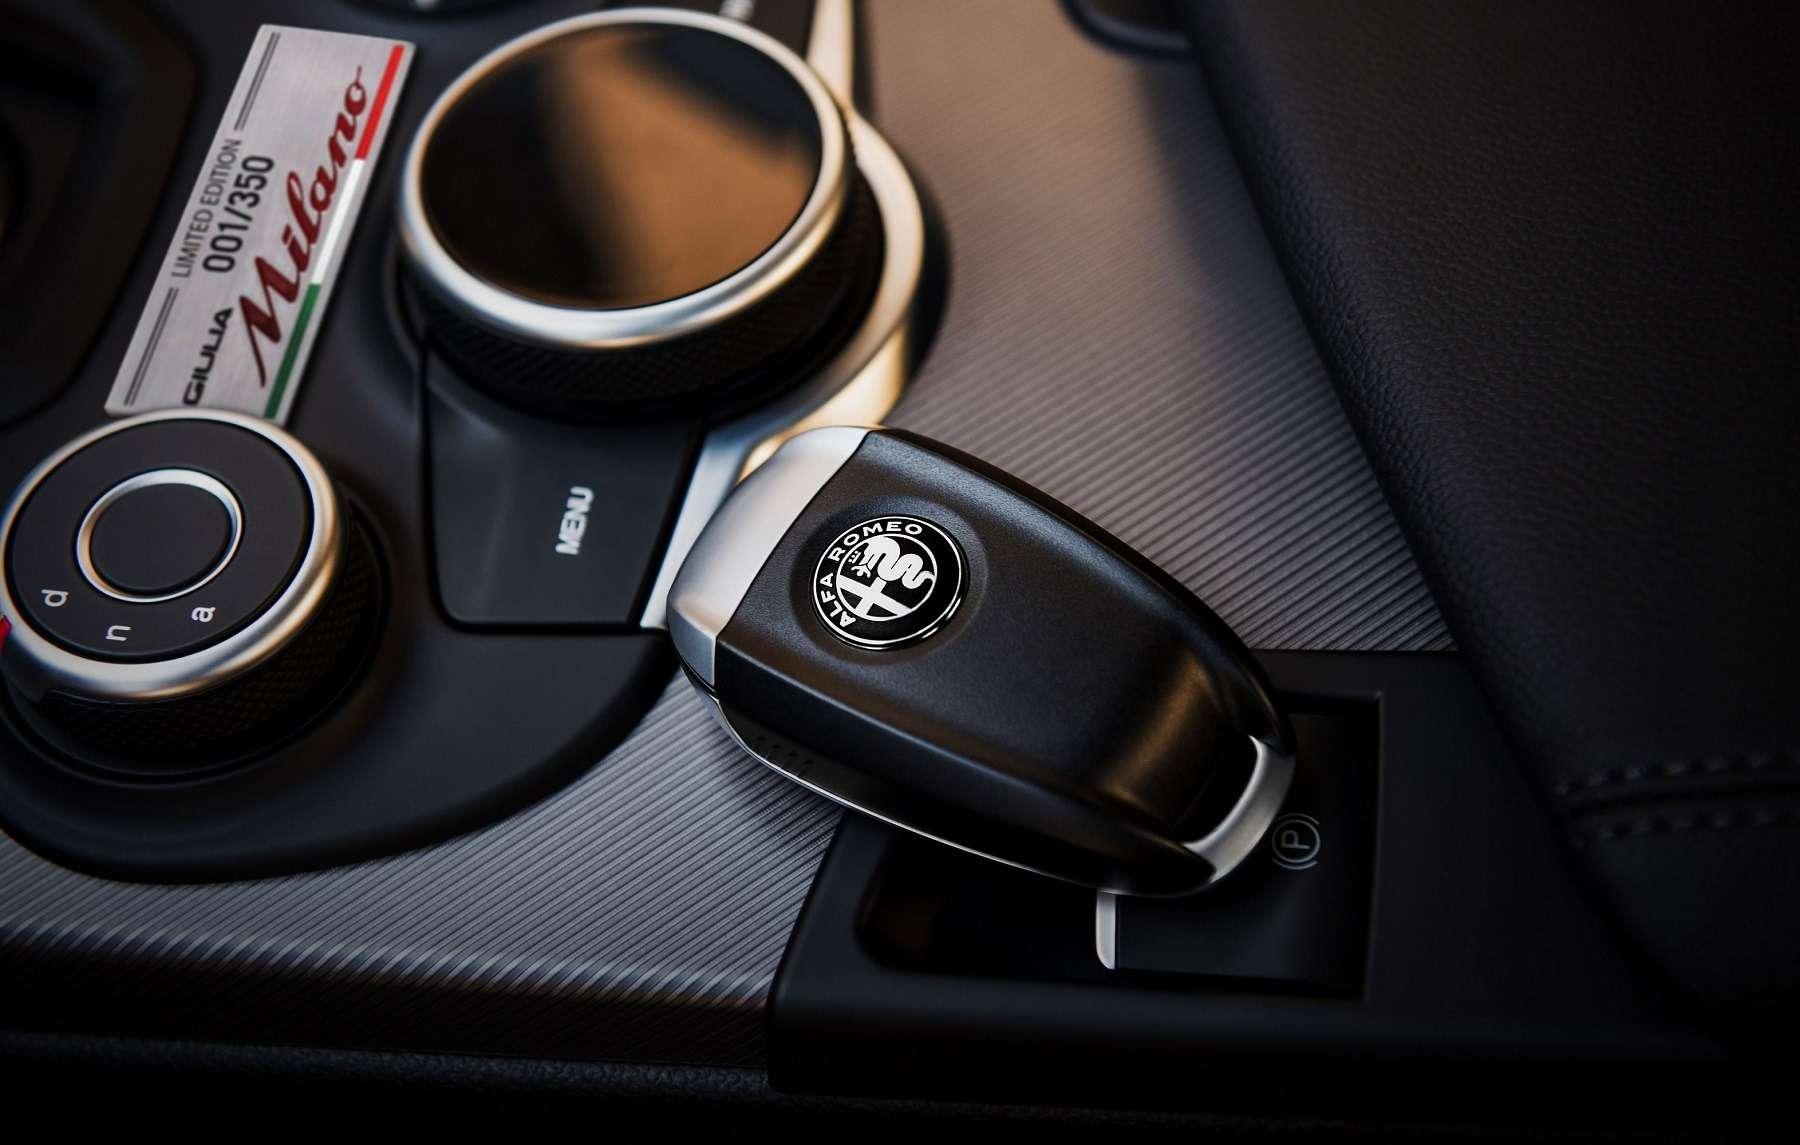 350машин за33секунды: китайцы оценили Alfa Romeo— фото 726161